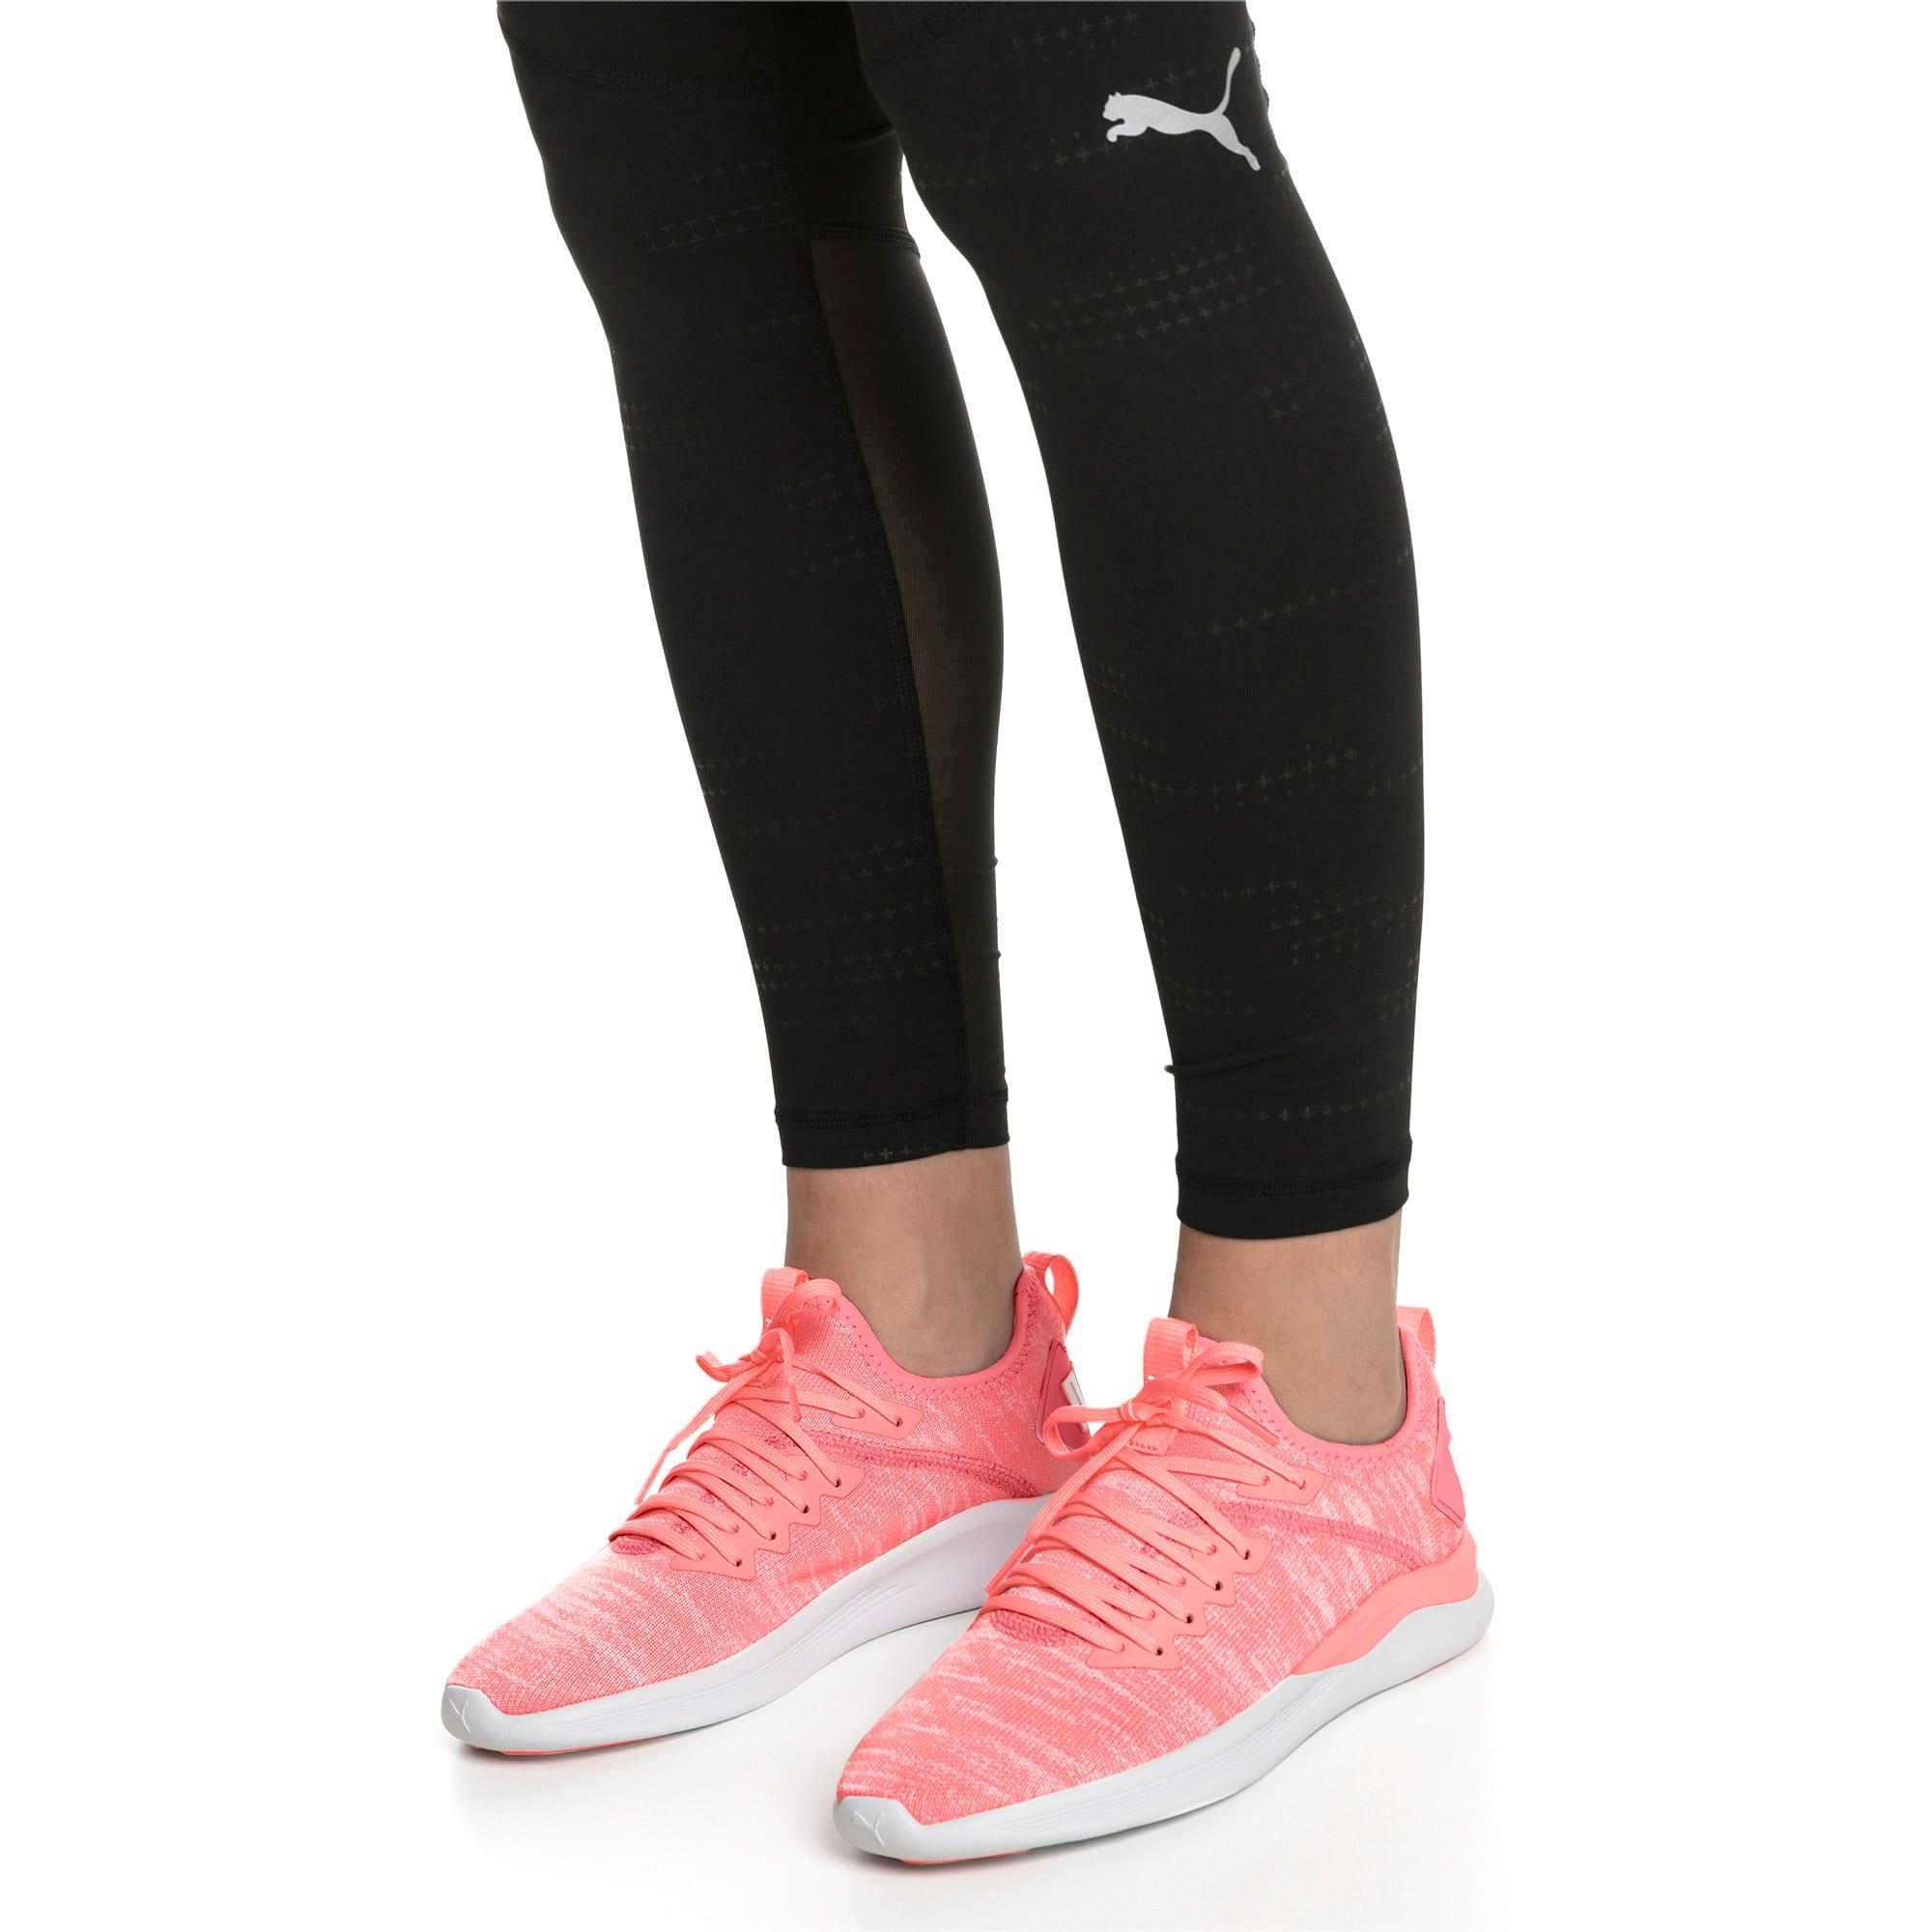 Thumbnail 2 of IGNITE Flash evoKNIT Women's Running Shoes, Bright Peach-Puma White, medium